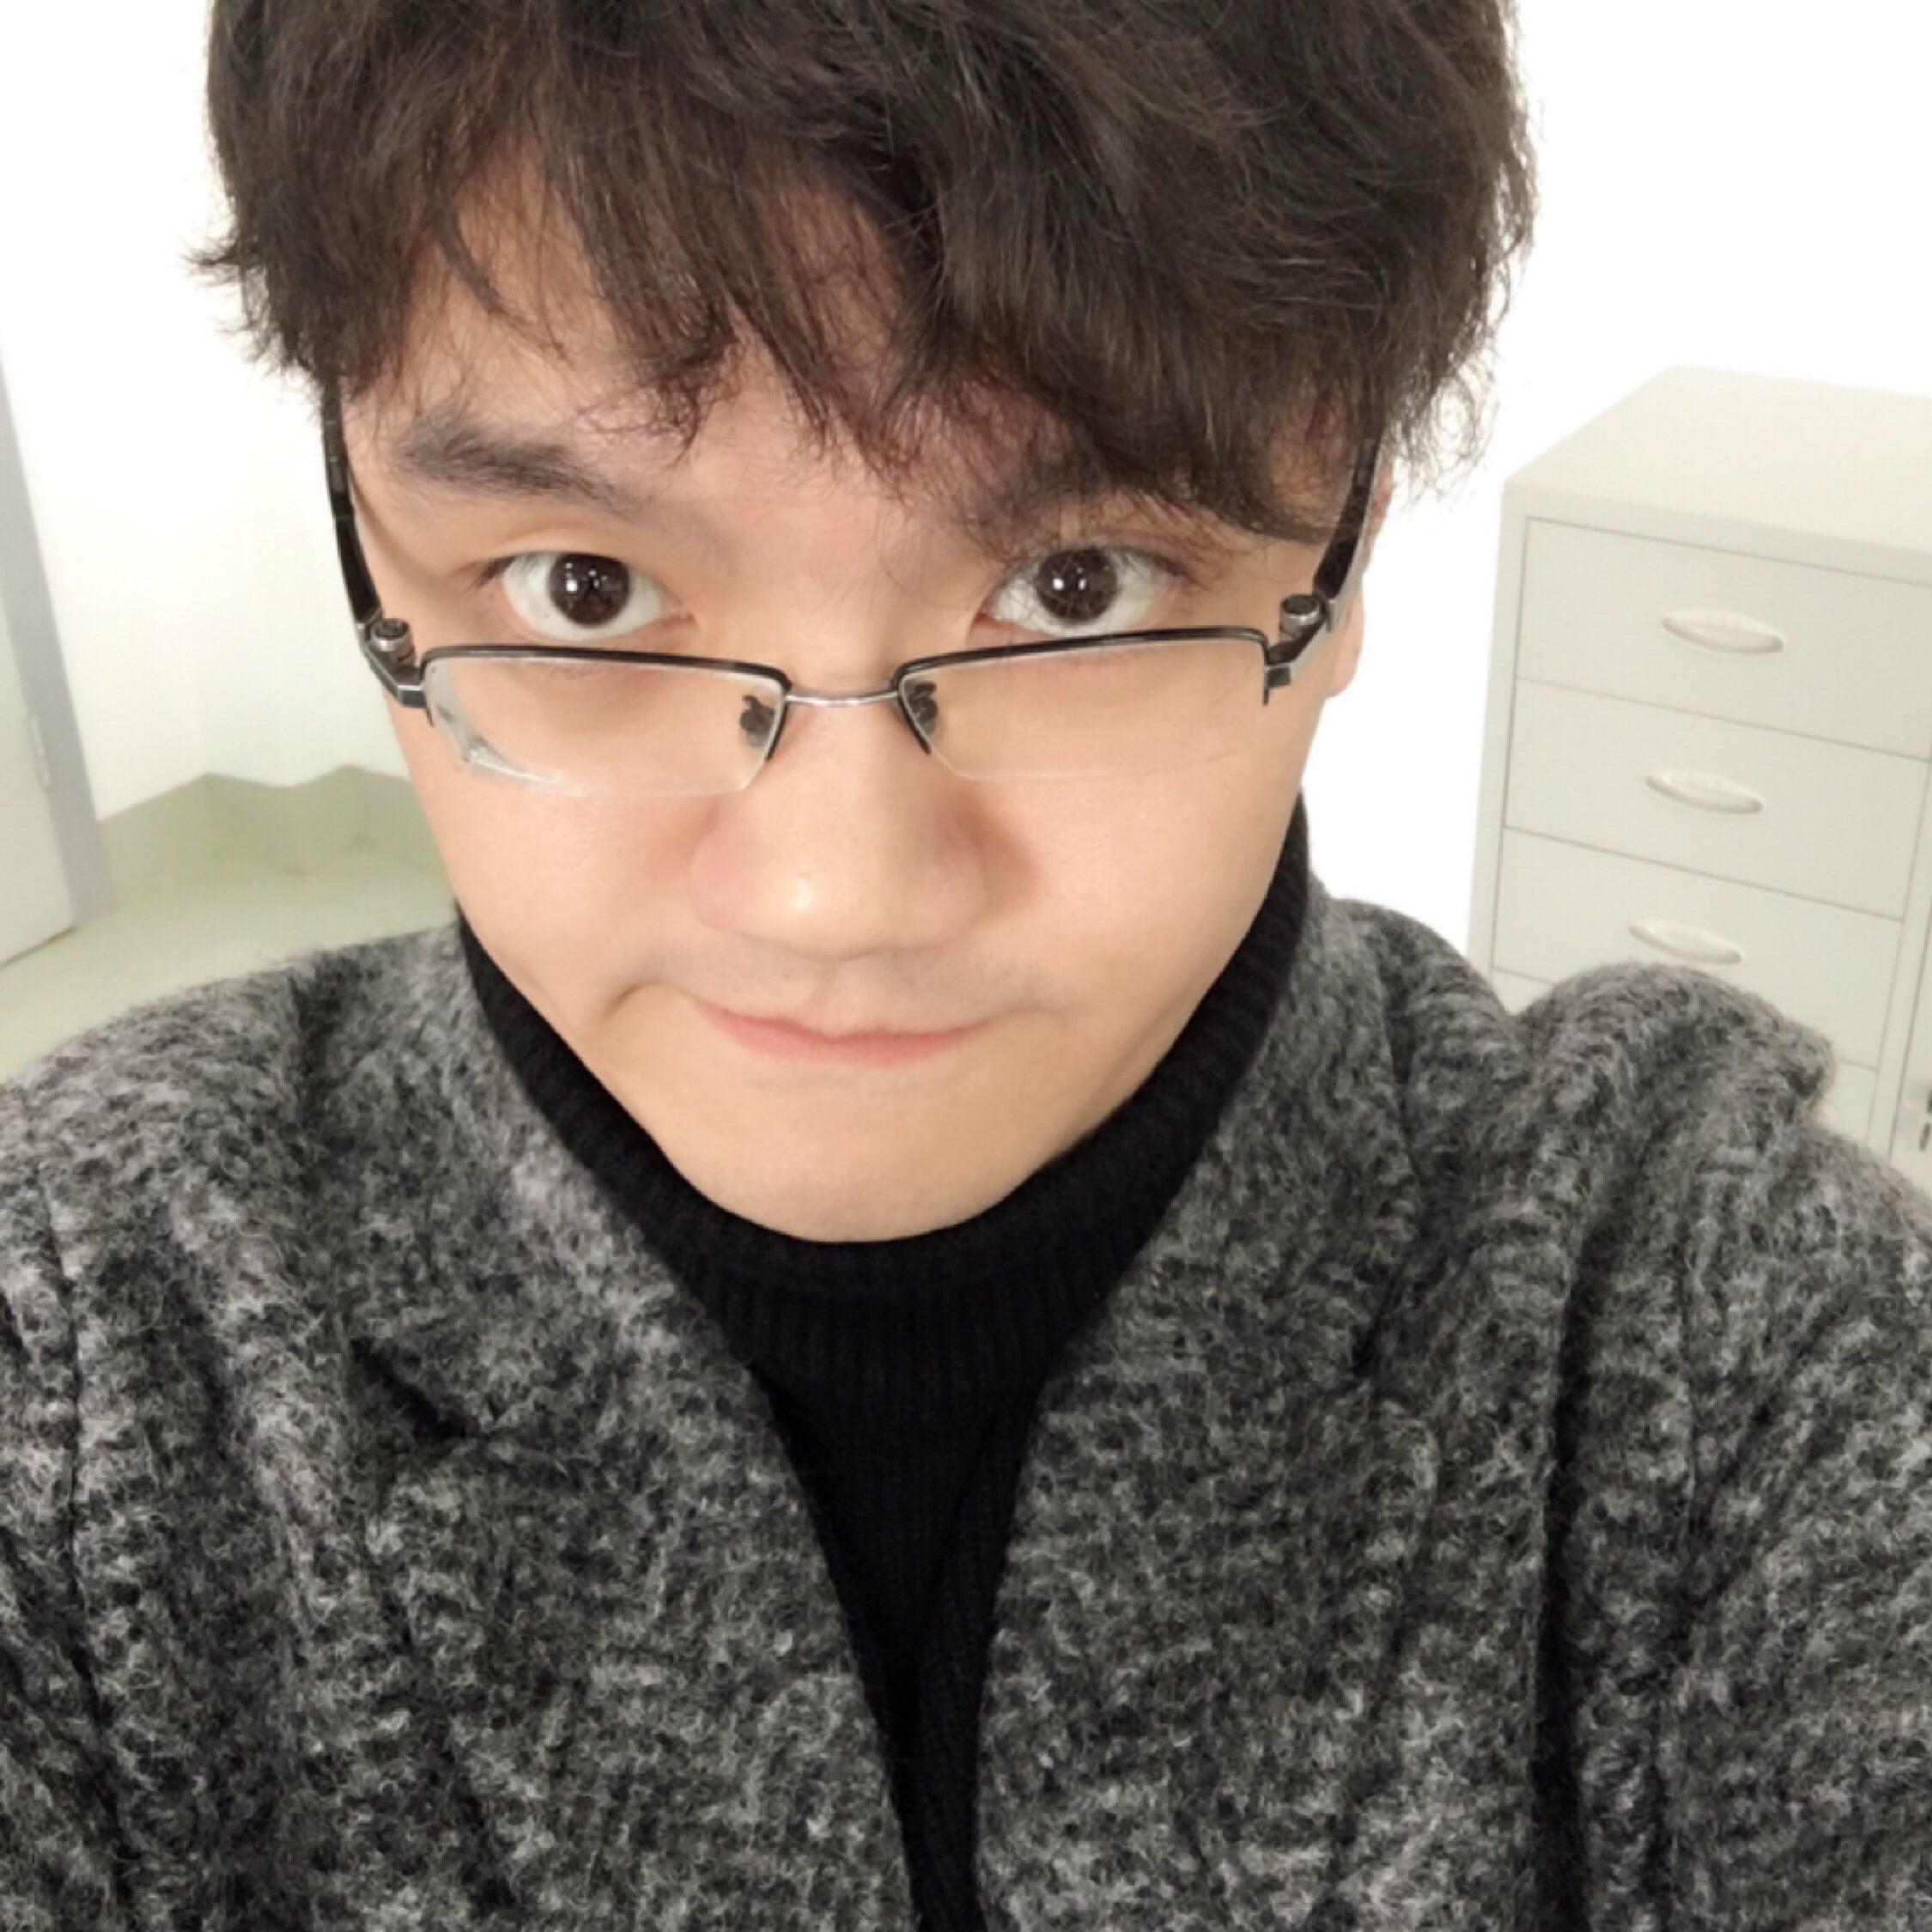 Mr傅先生